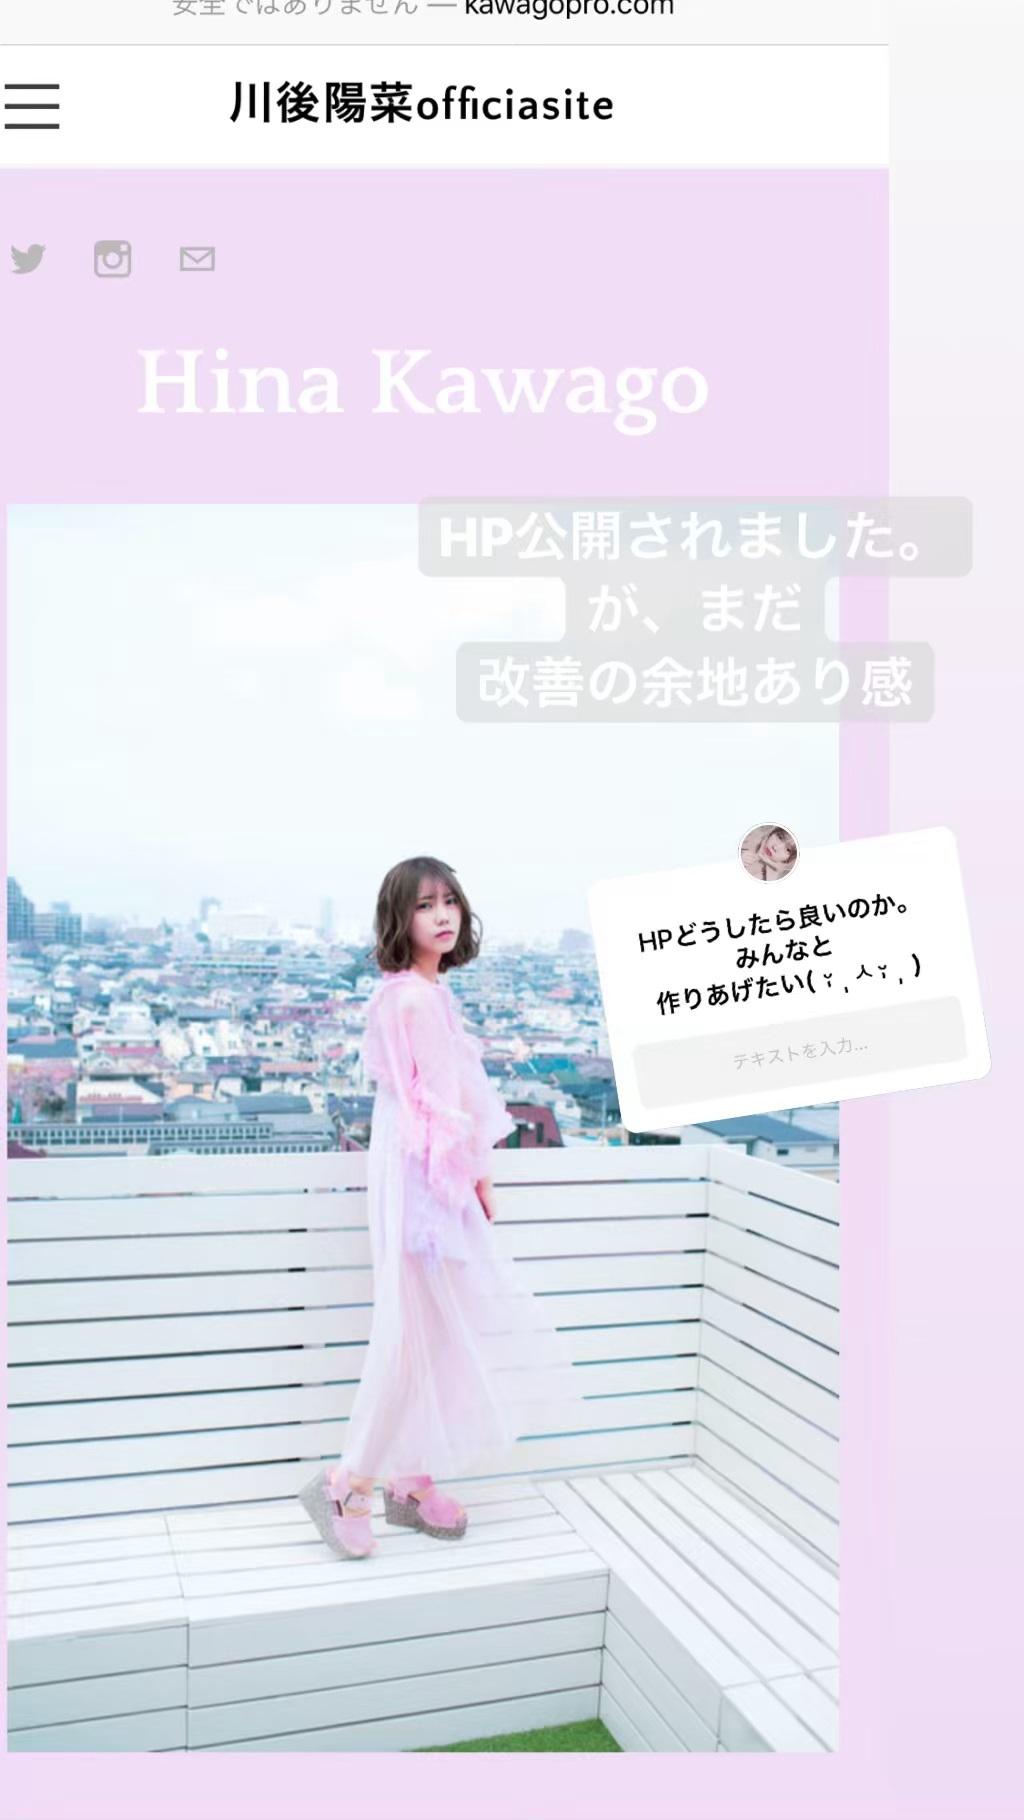 川後陽菜officialsite 自作